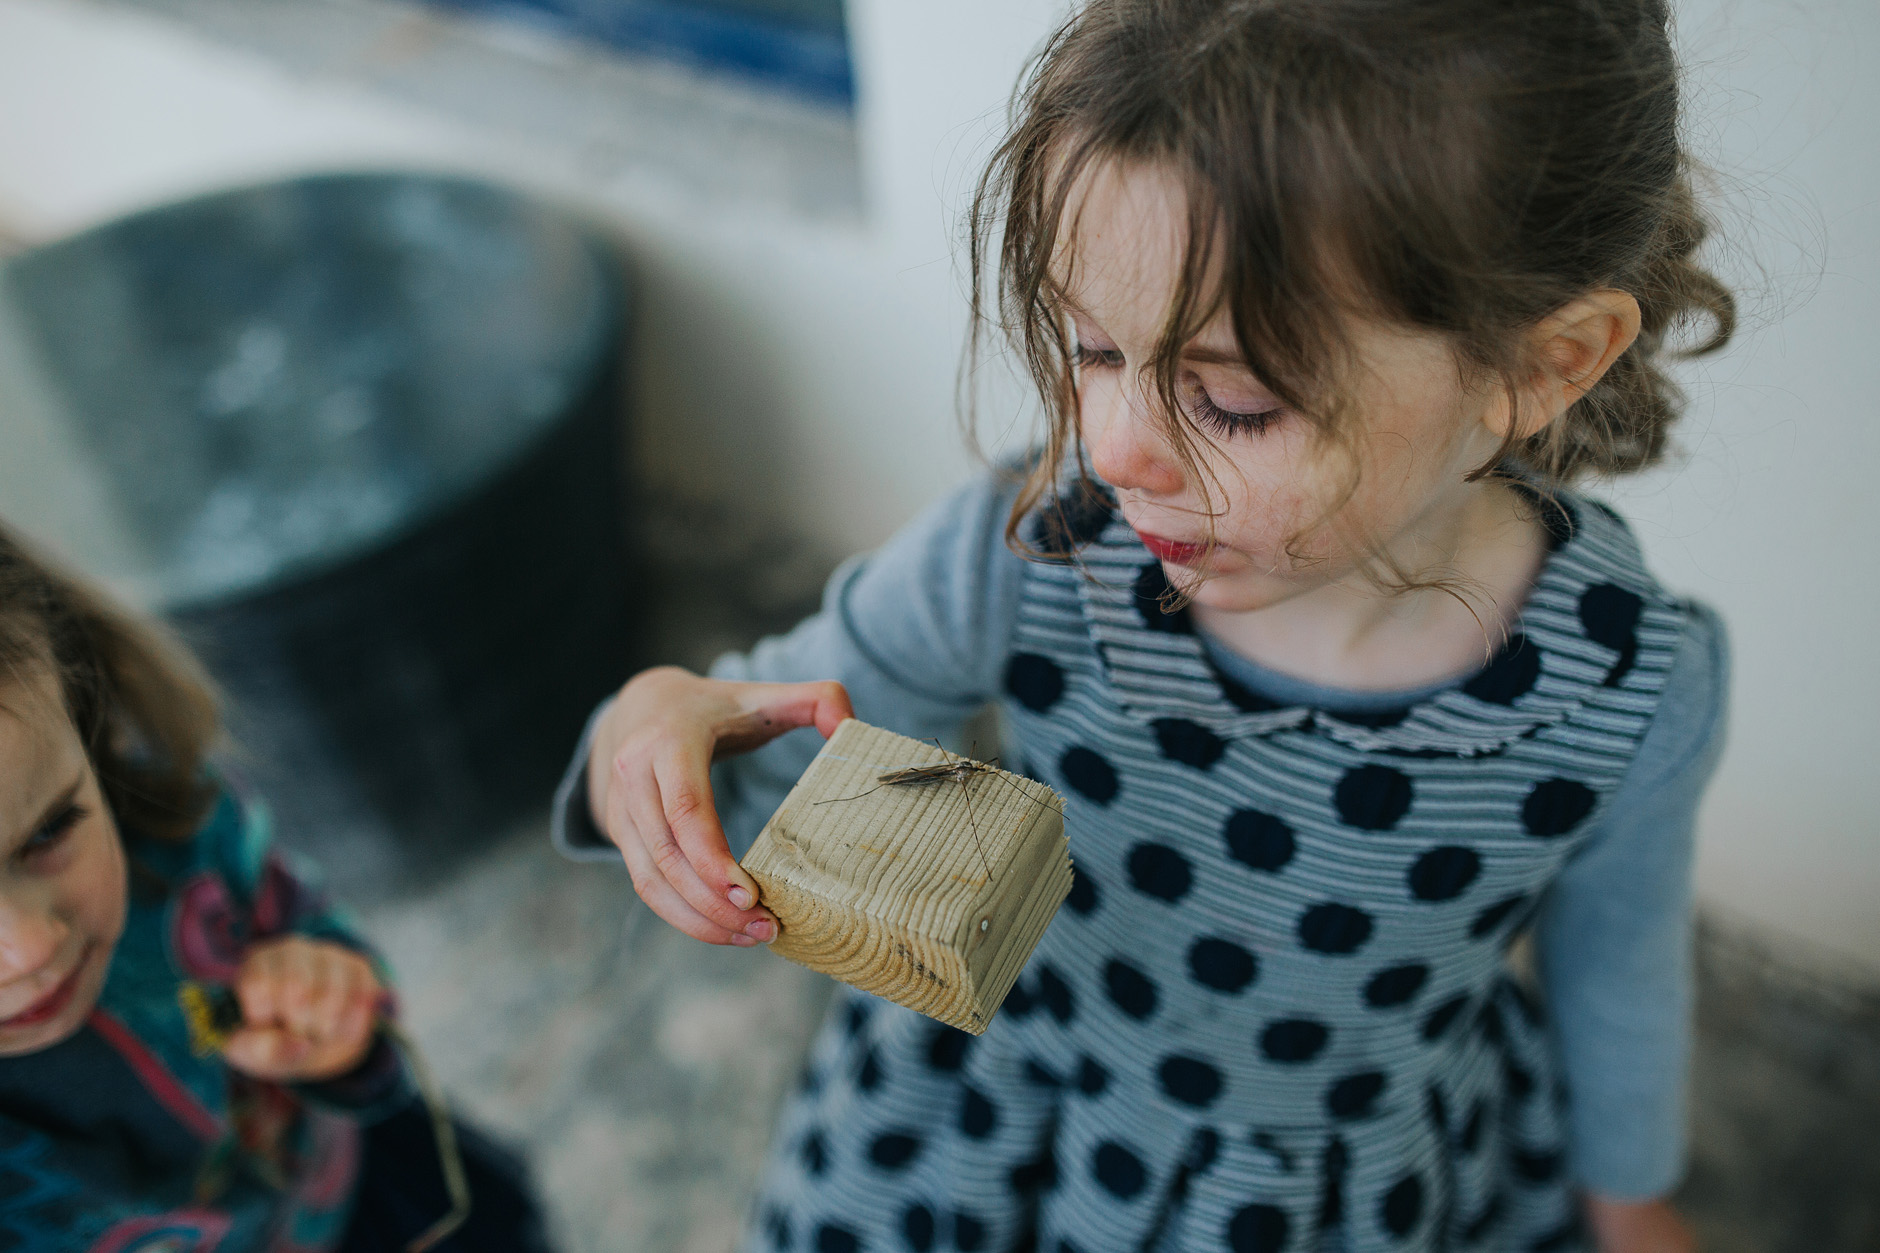 candid-natural-children-family-photographer-dublin-0051.jpg